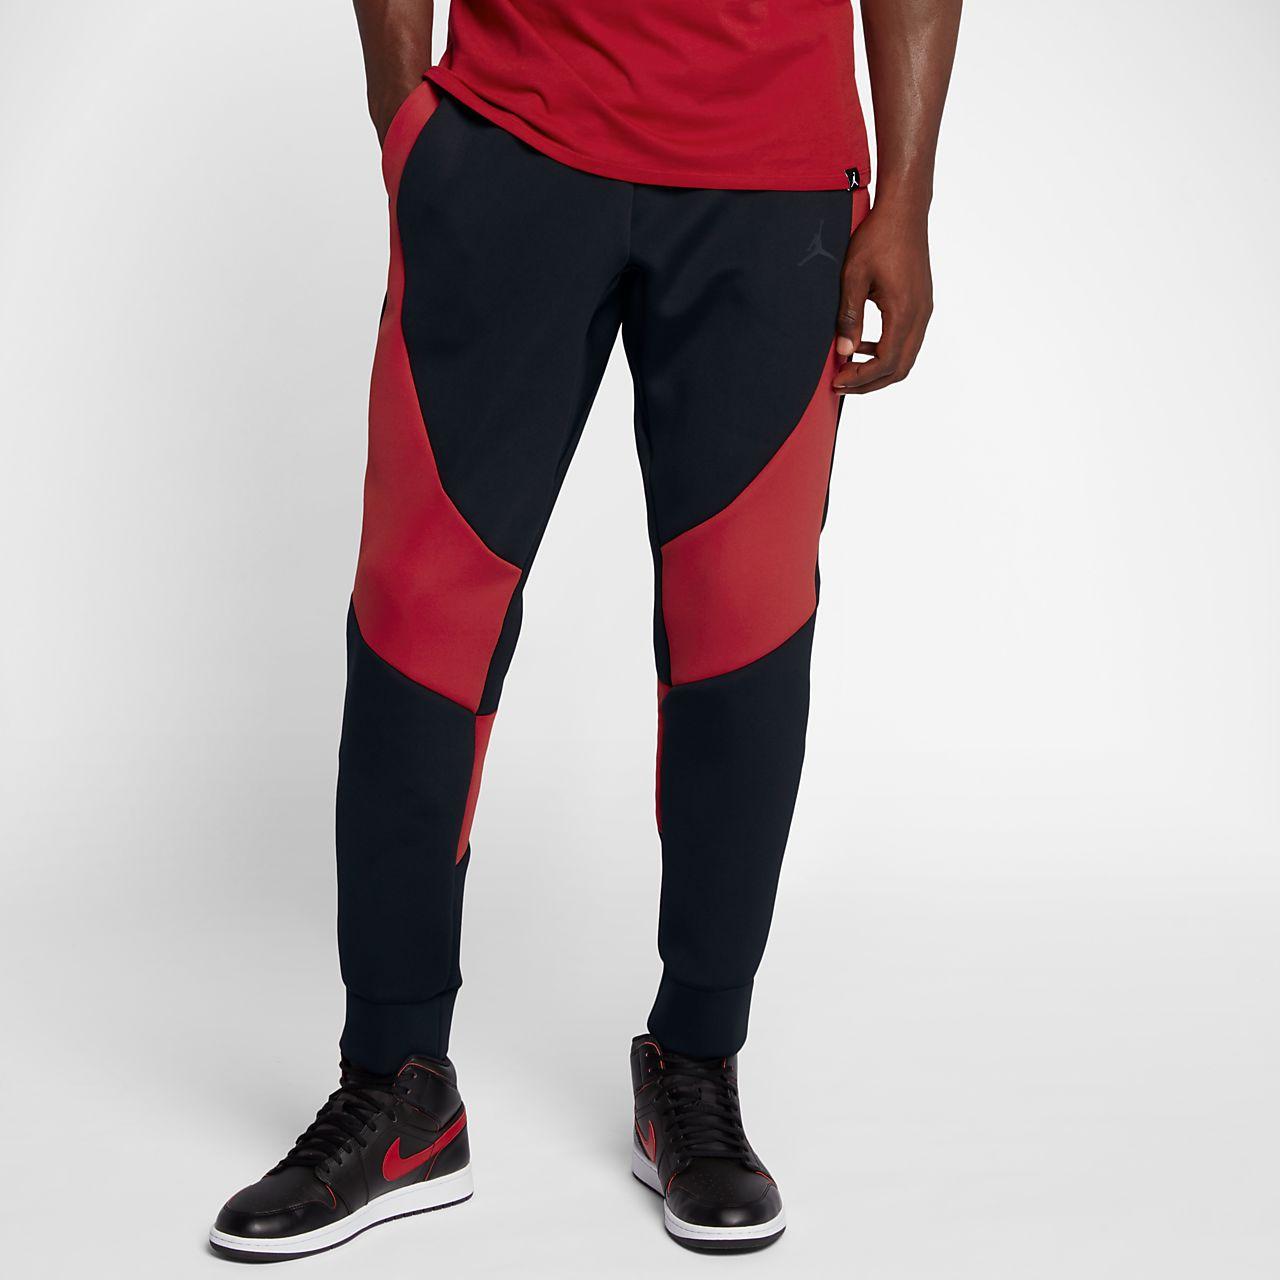 8a67342876e black and red jordan fleece fabric jordan fleece pants